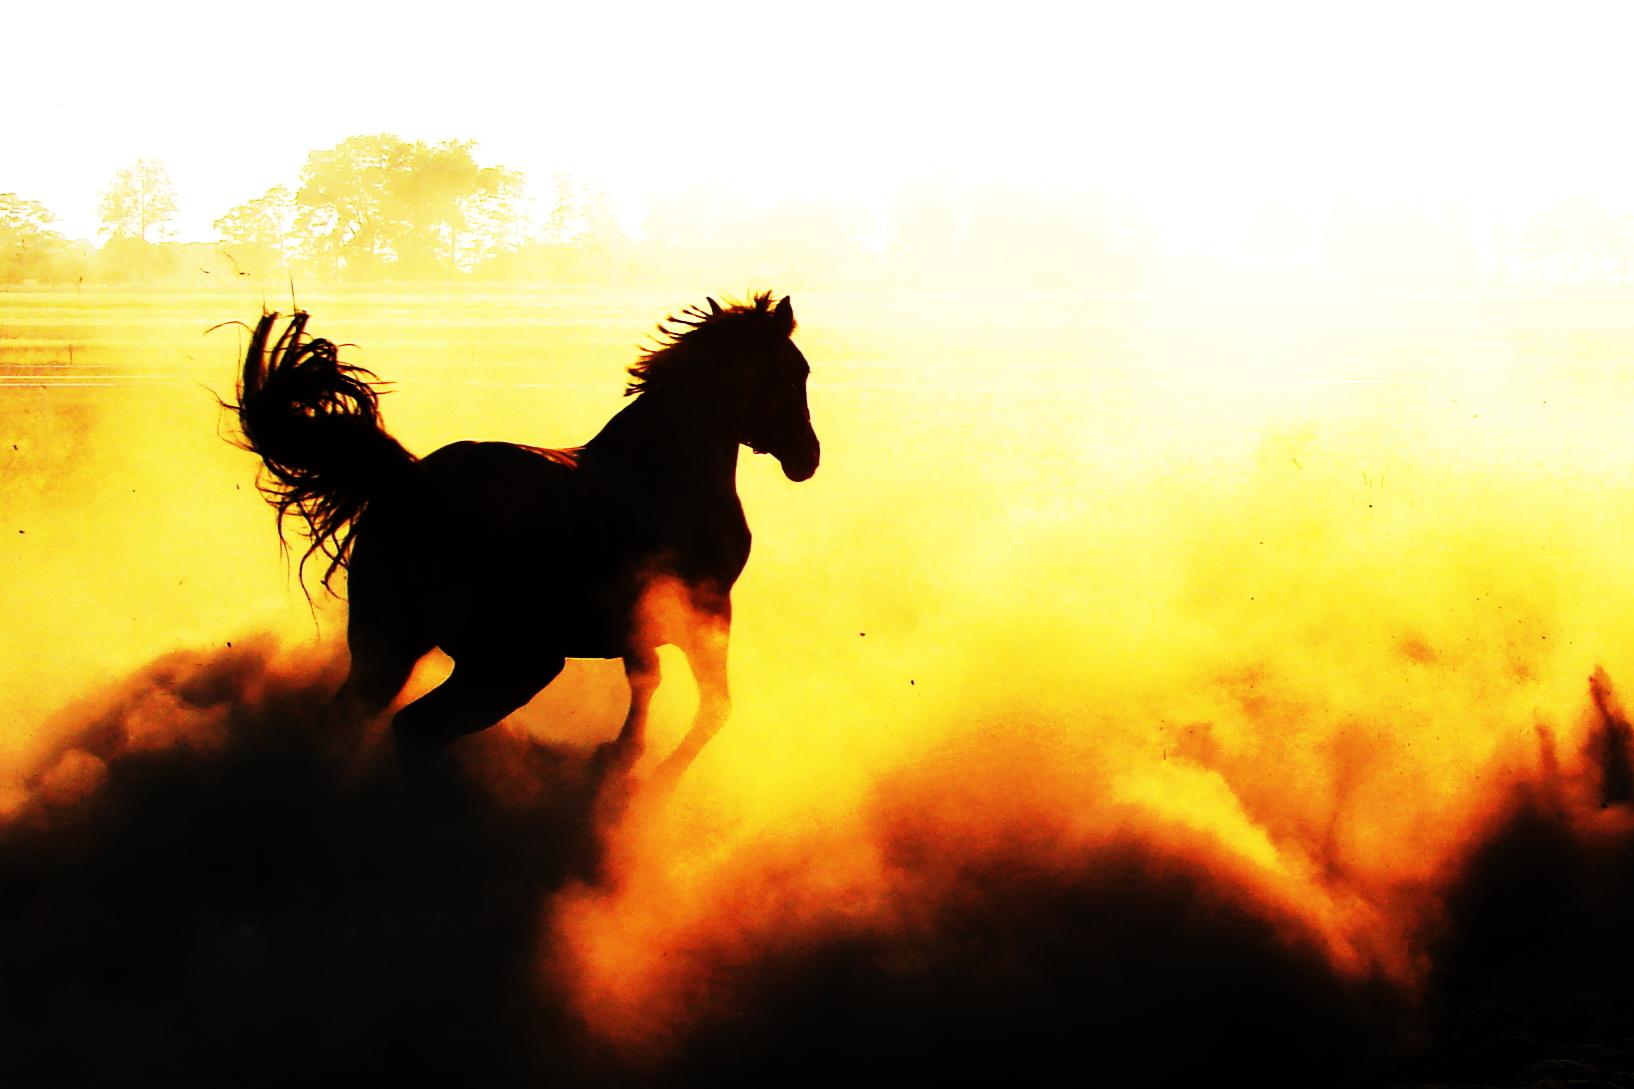 Black Hills Wild Horse Sanctuary Change By Doing